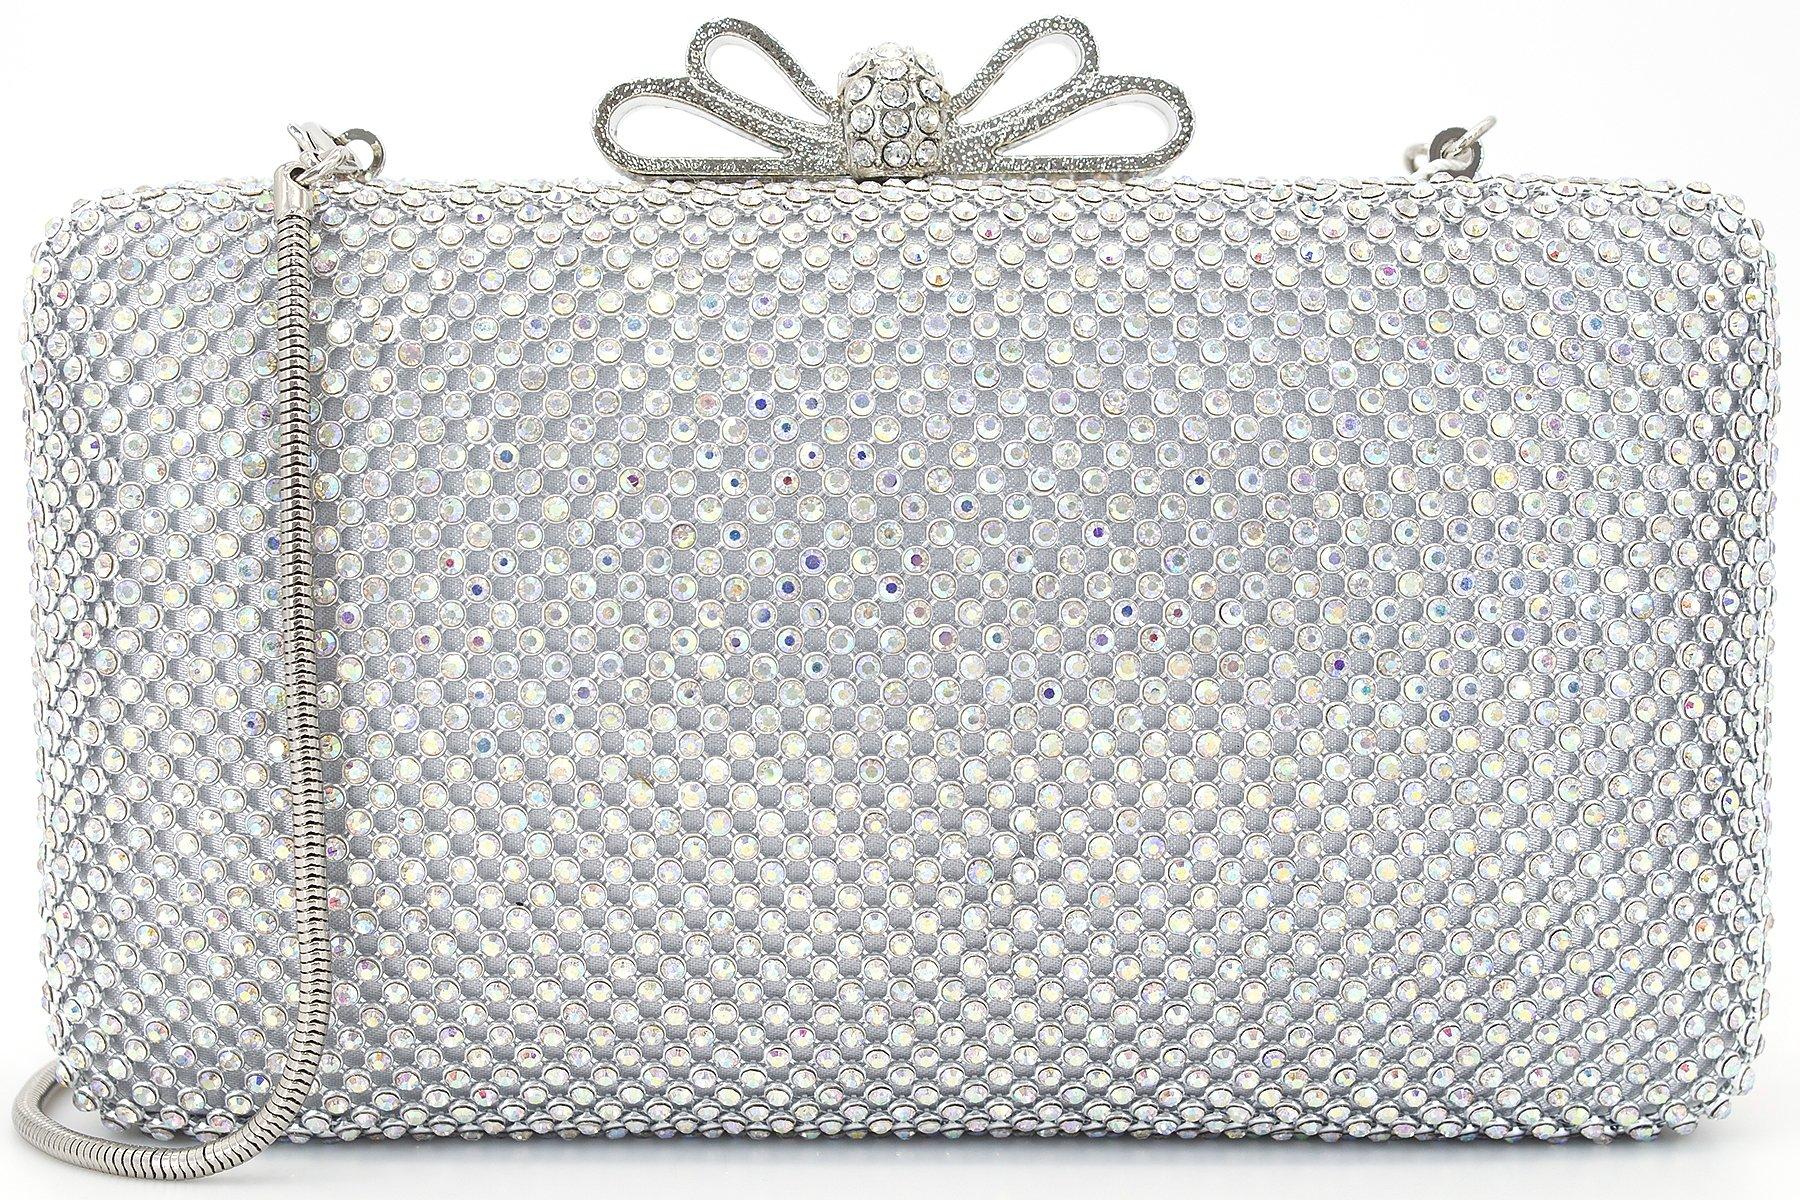 Dexmay Bling Rhinestone Crystal Clutch Purse Bow Clasp Women Evening Bag for Bridesmaid Wedding Party AB silver